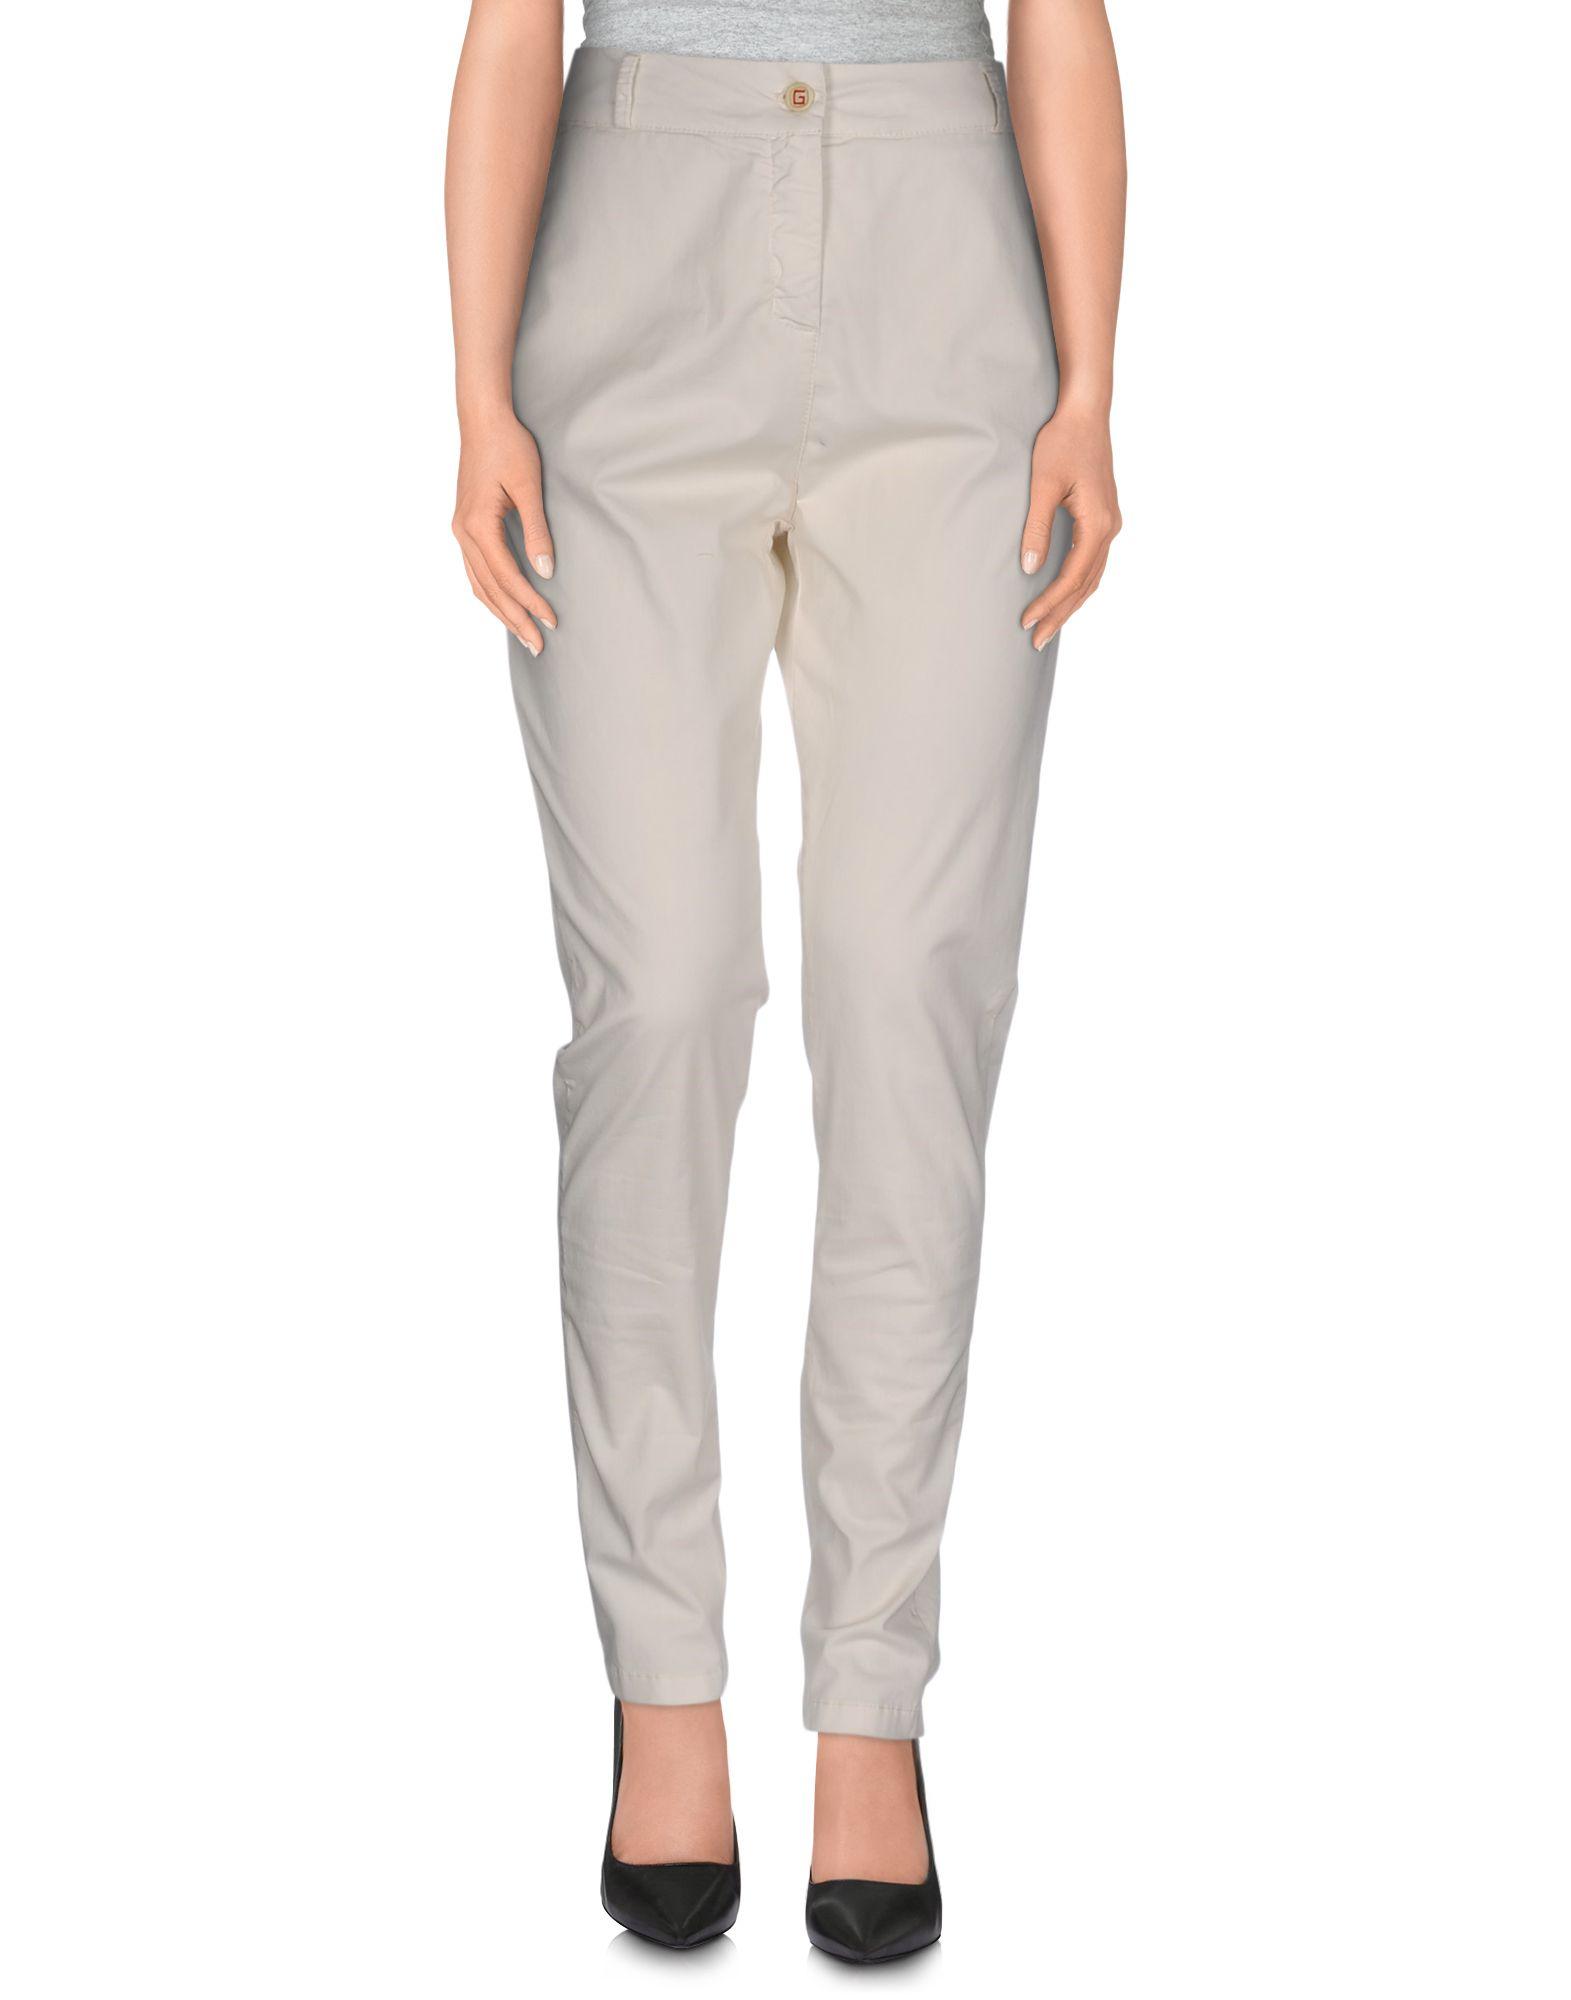 GUARDAROBA by ANIYE BY Damen Hose Farbe Weiß Größe 4